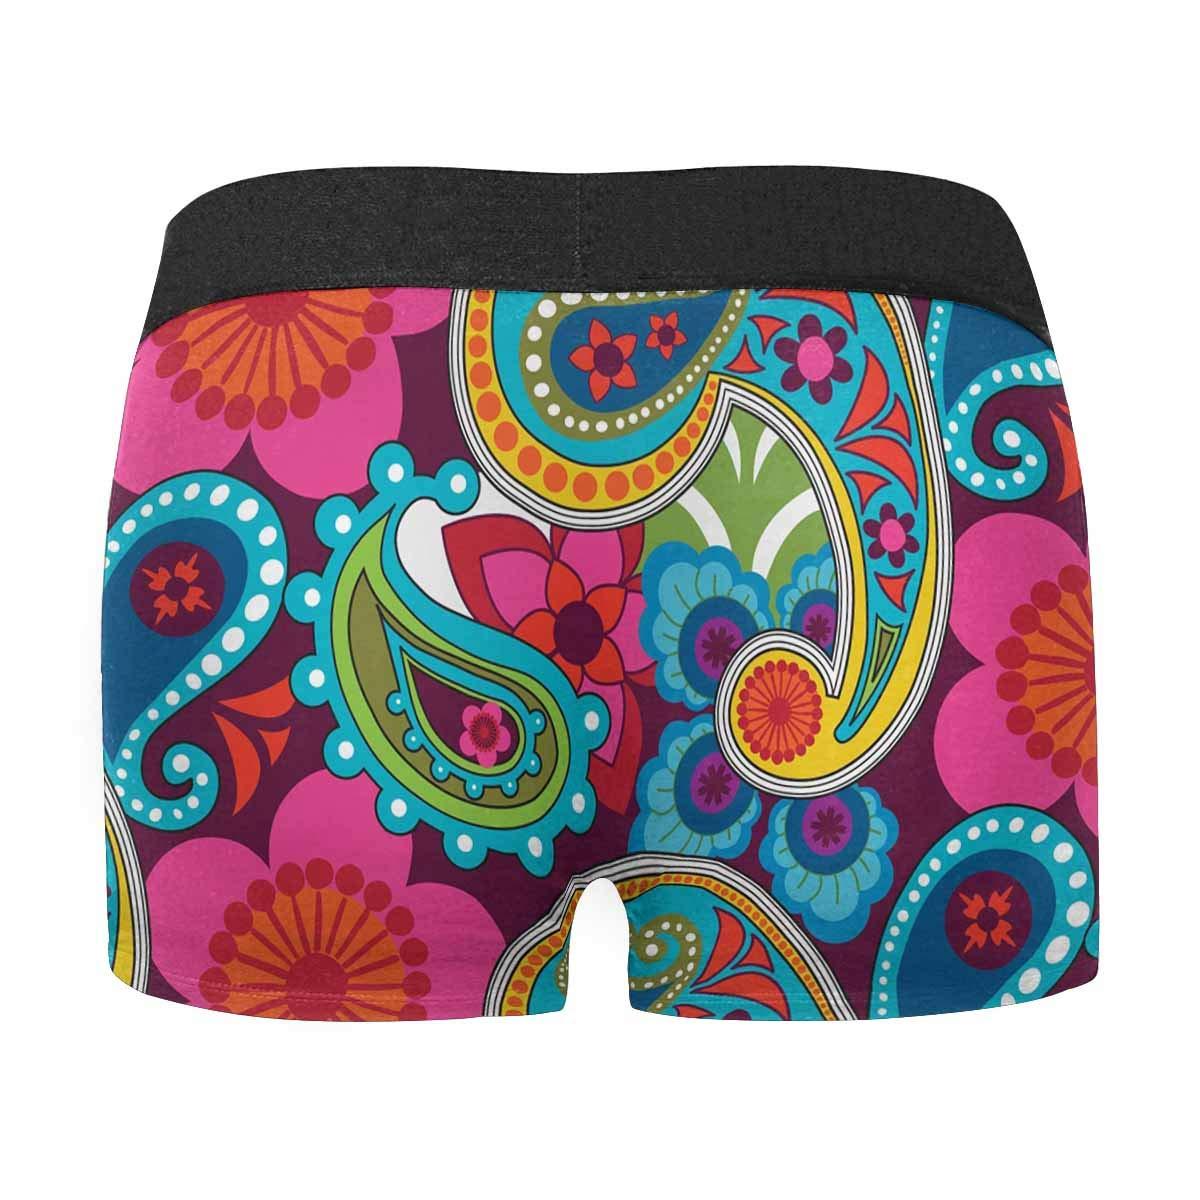 XS-3XL INTERESTPRINT Boxer Briefs Mens Underwear Paisley Indian Floral